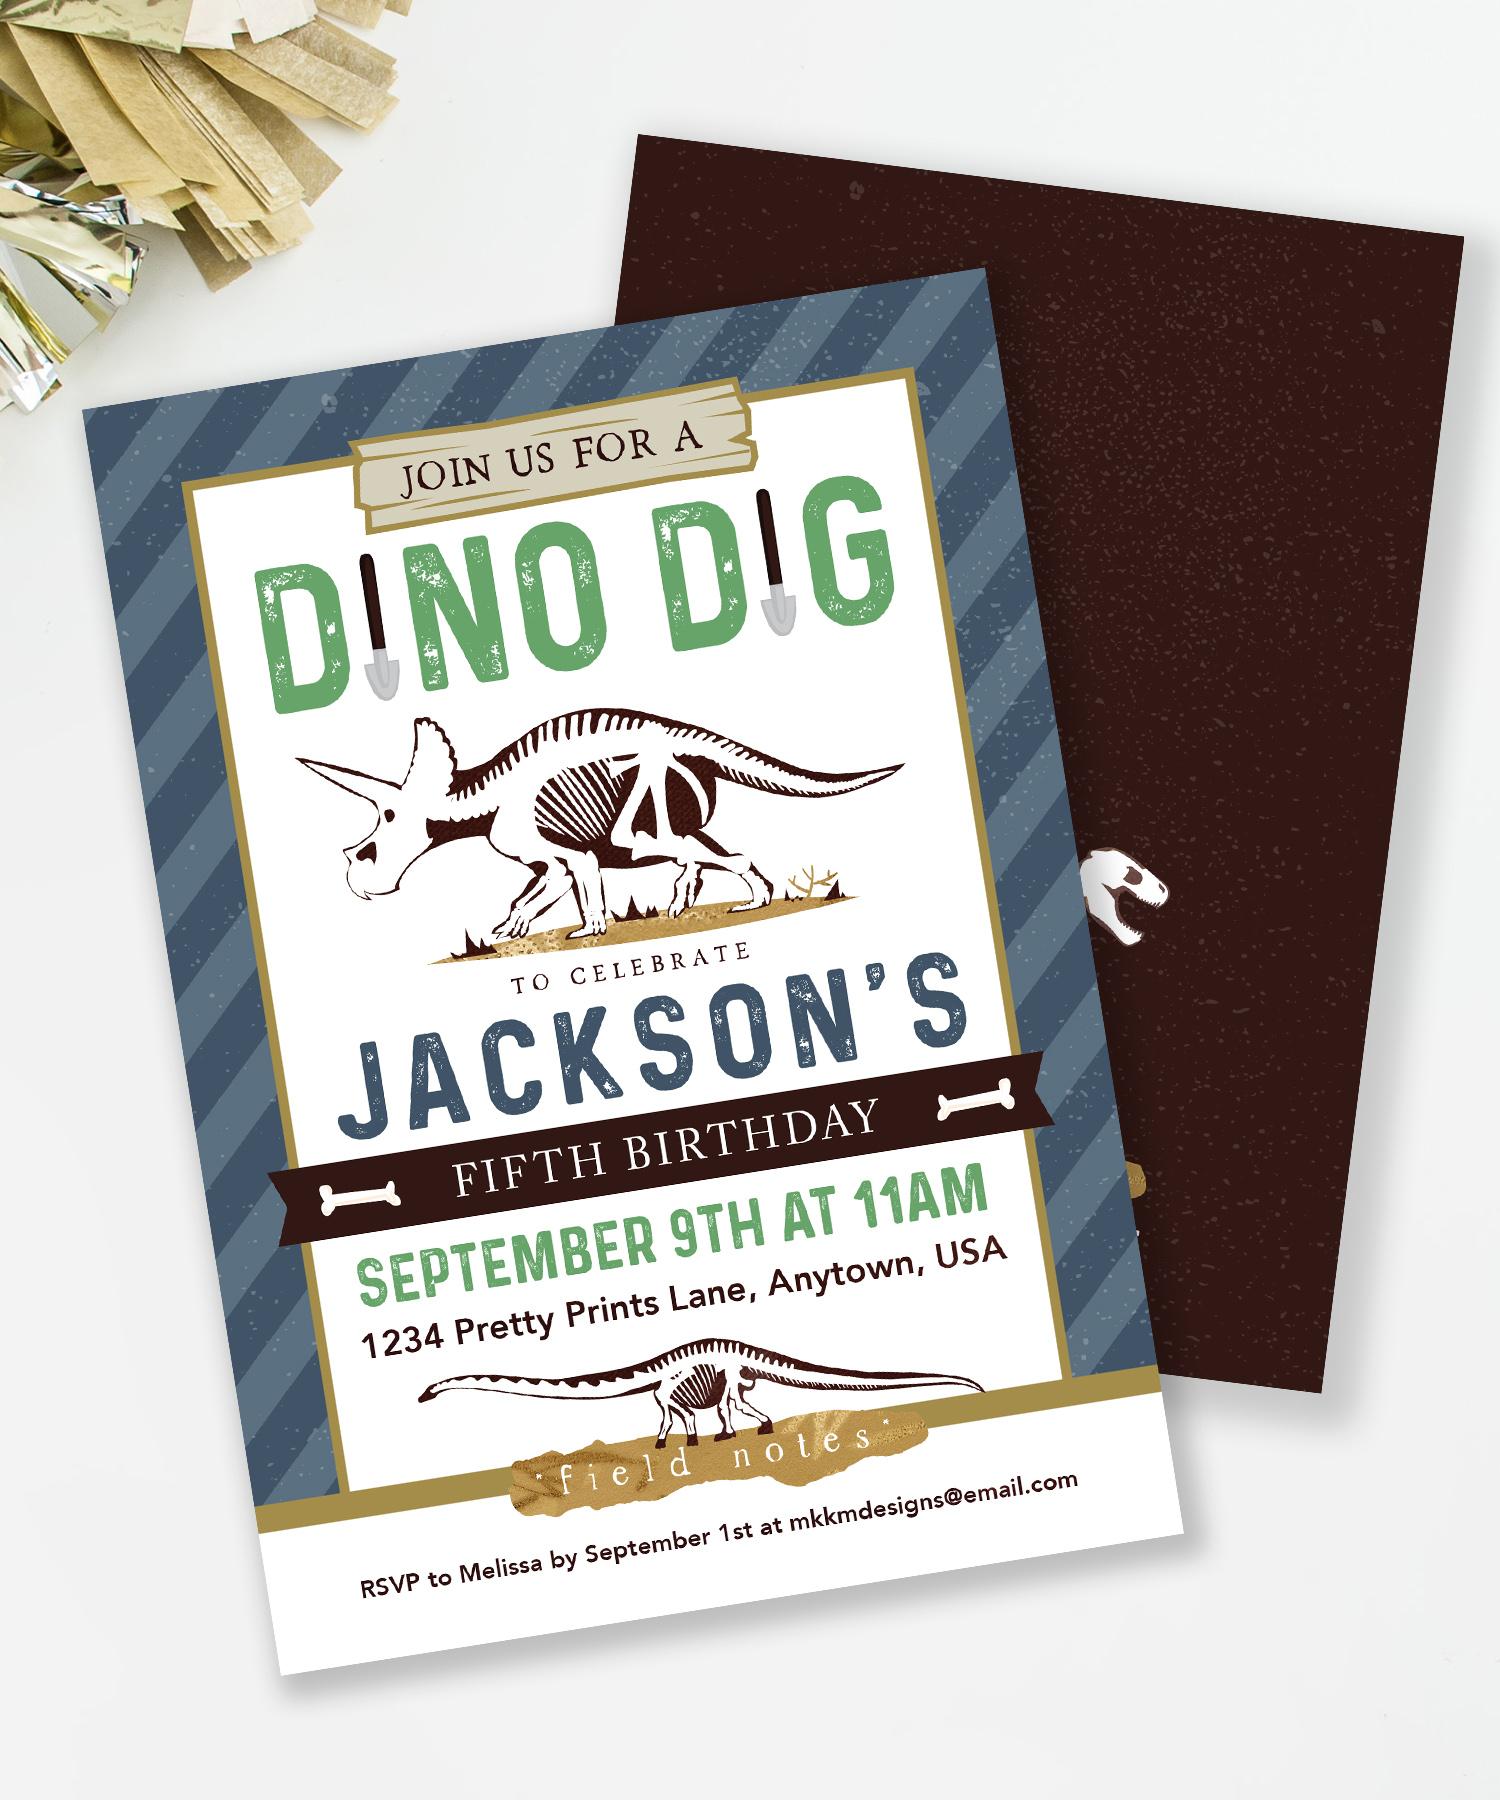 Dinosaur Dig Party Package — MKKM Designs